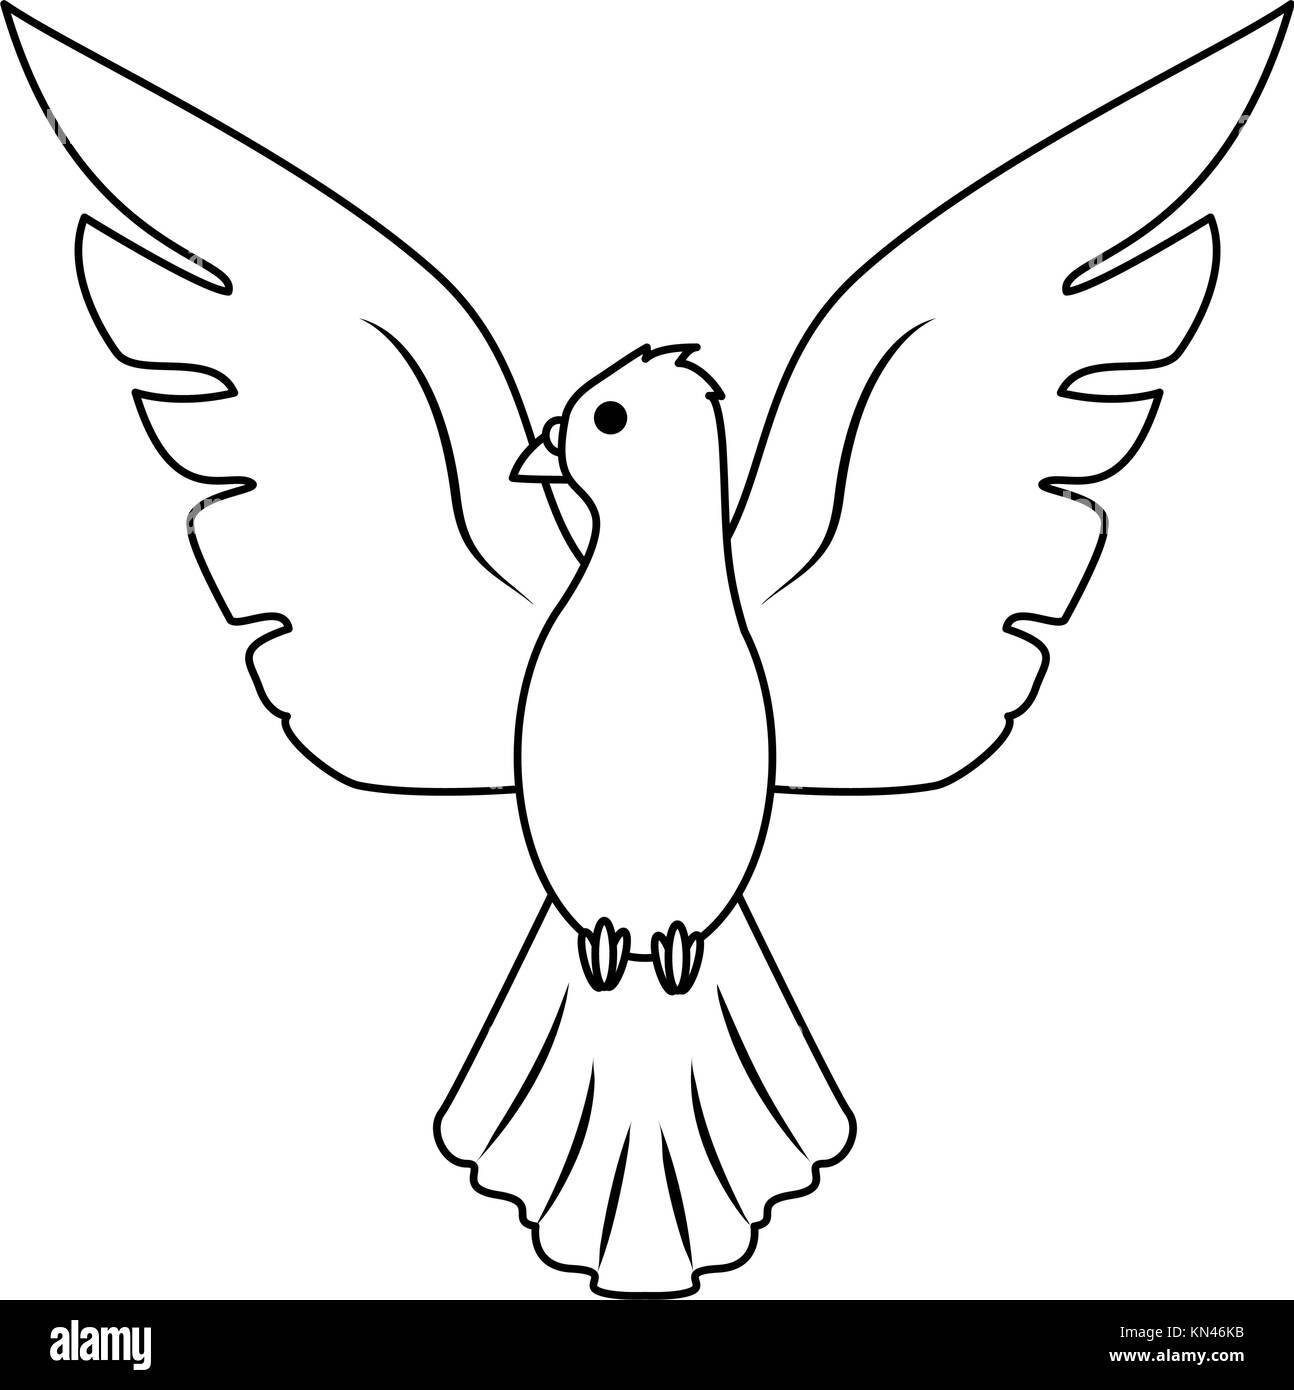 Flying bird cartoon black and white - photo#52